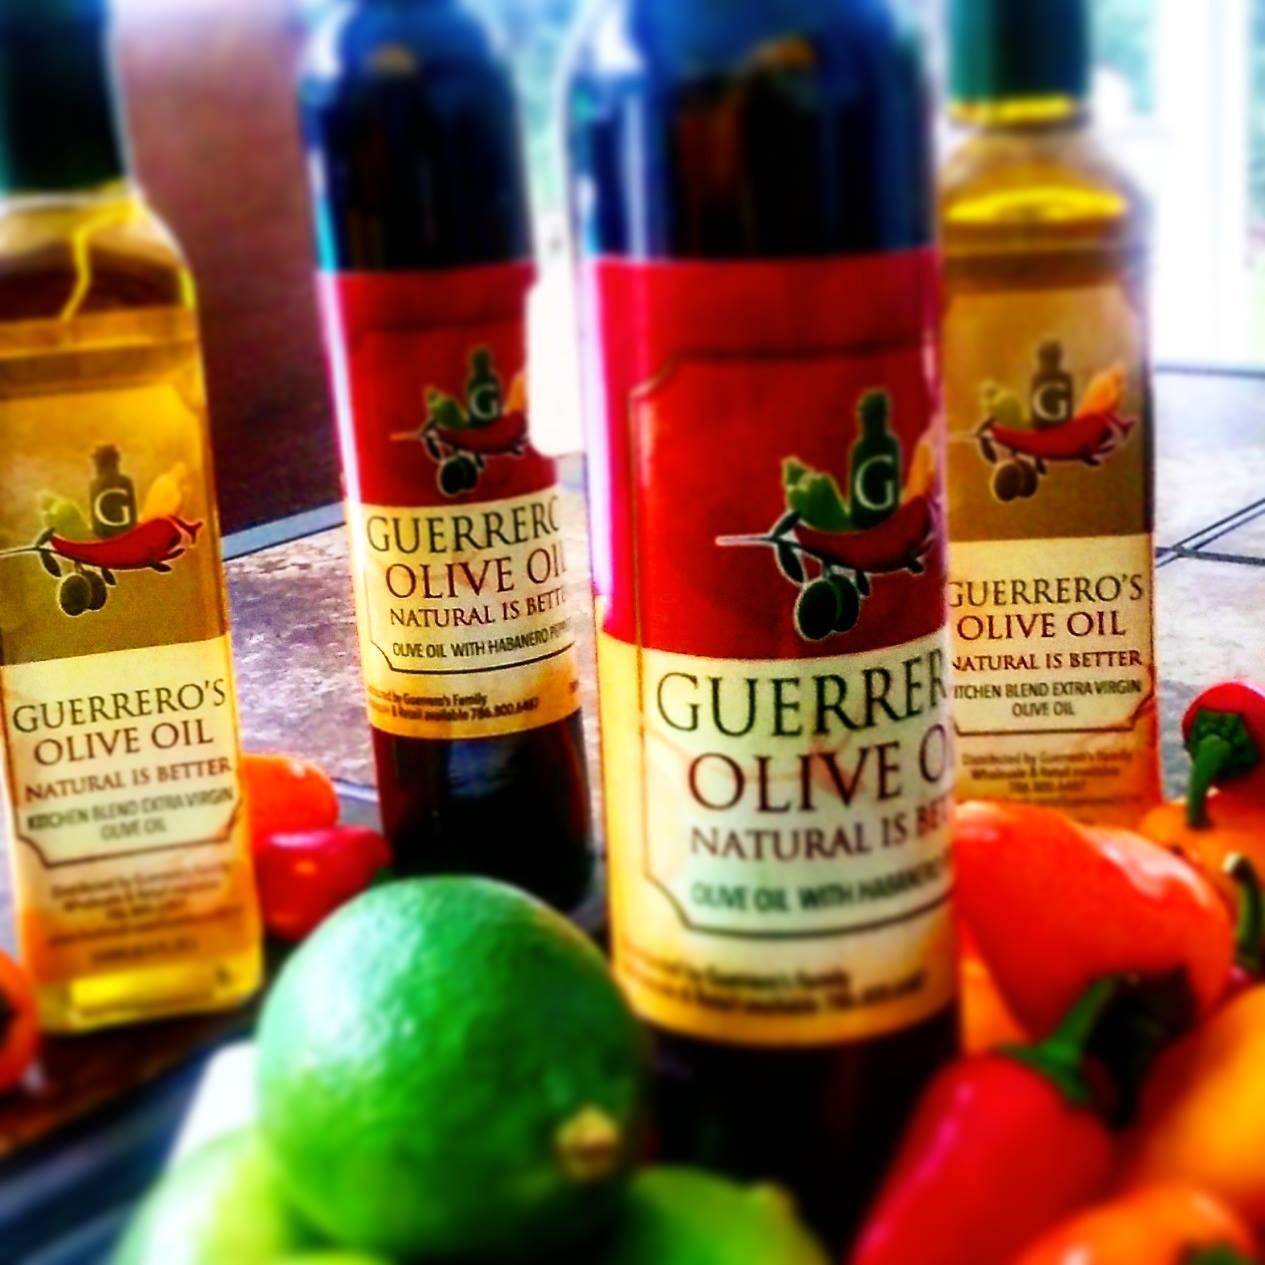 Guerrero's Olive Oil